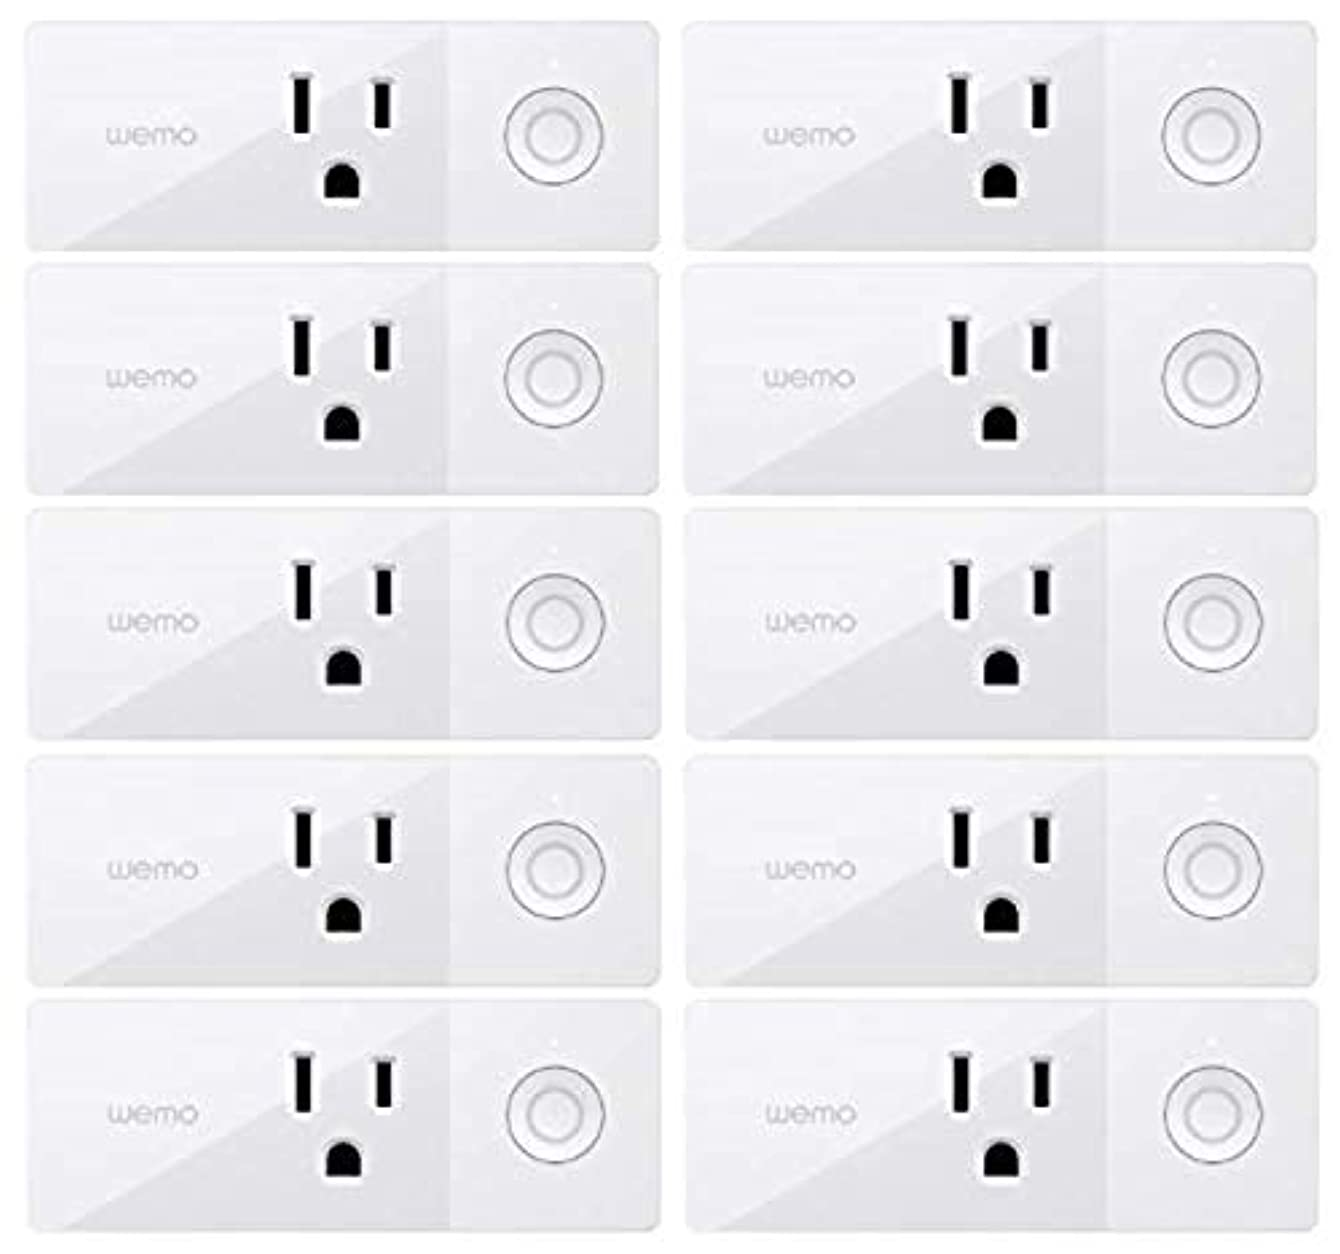 Wemo Mini Smart Plug, Wi-Fi Enabled, Compatible with Alexa (F7C063-RM2) (10 pack) (Renewed)